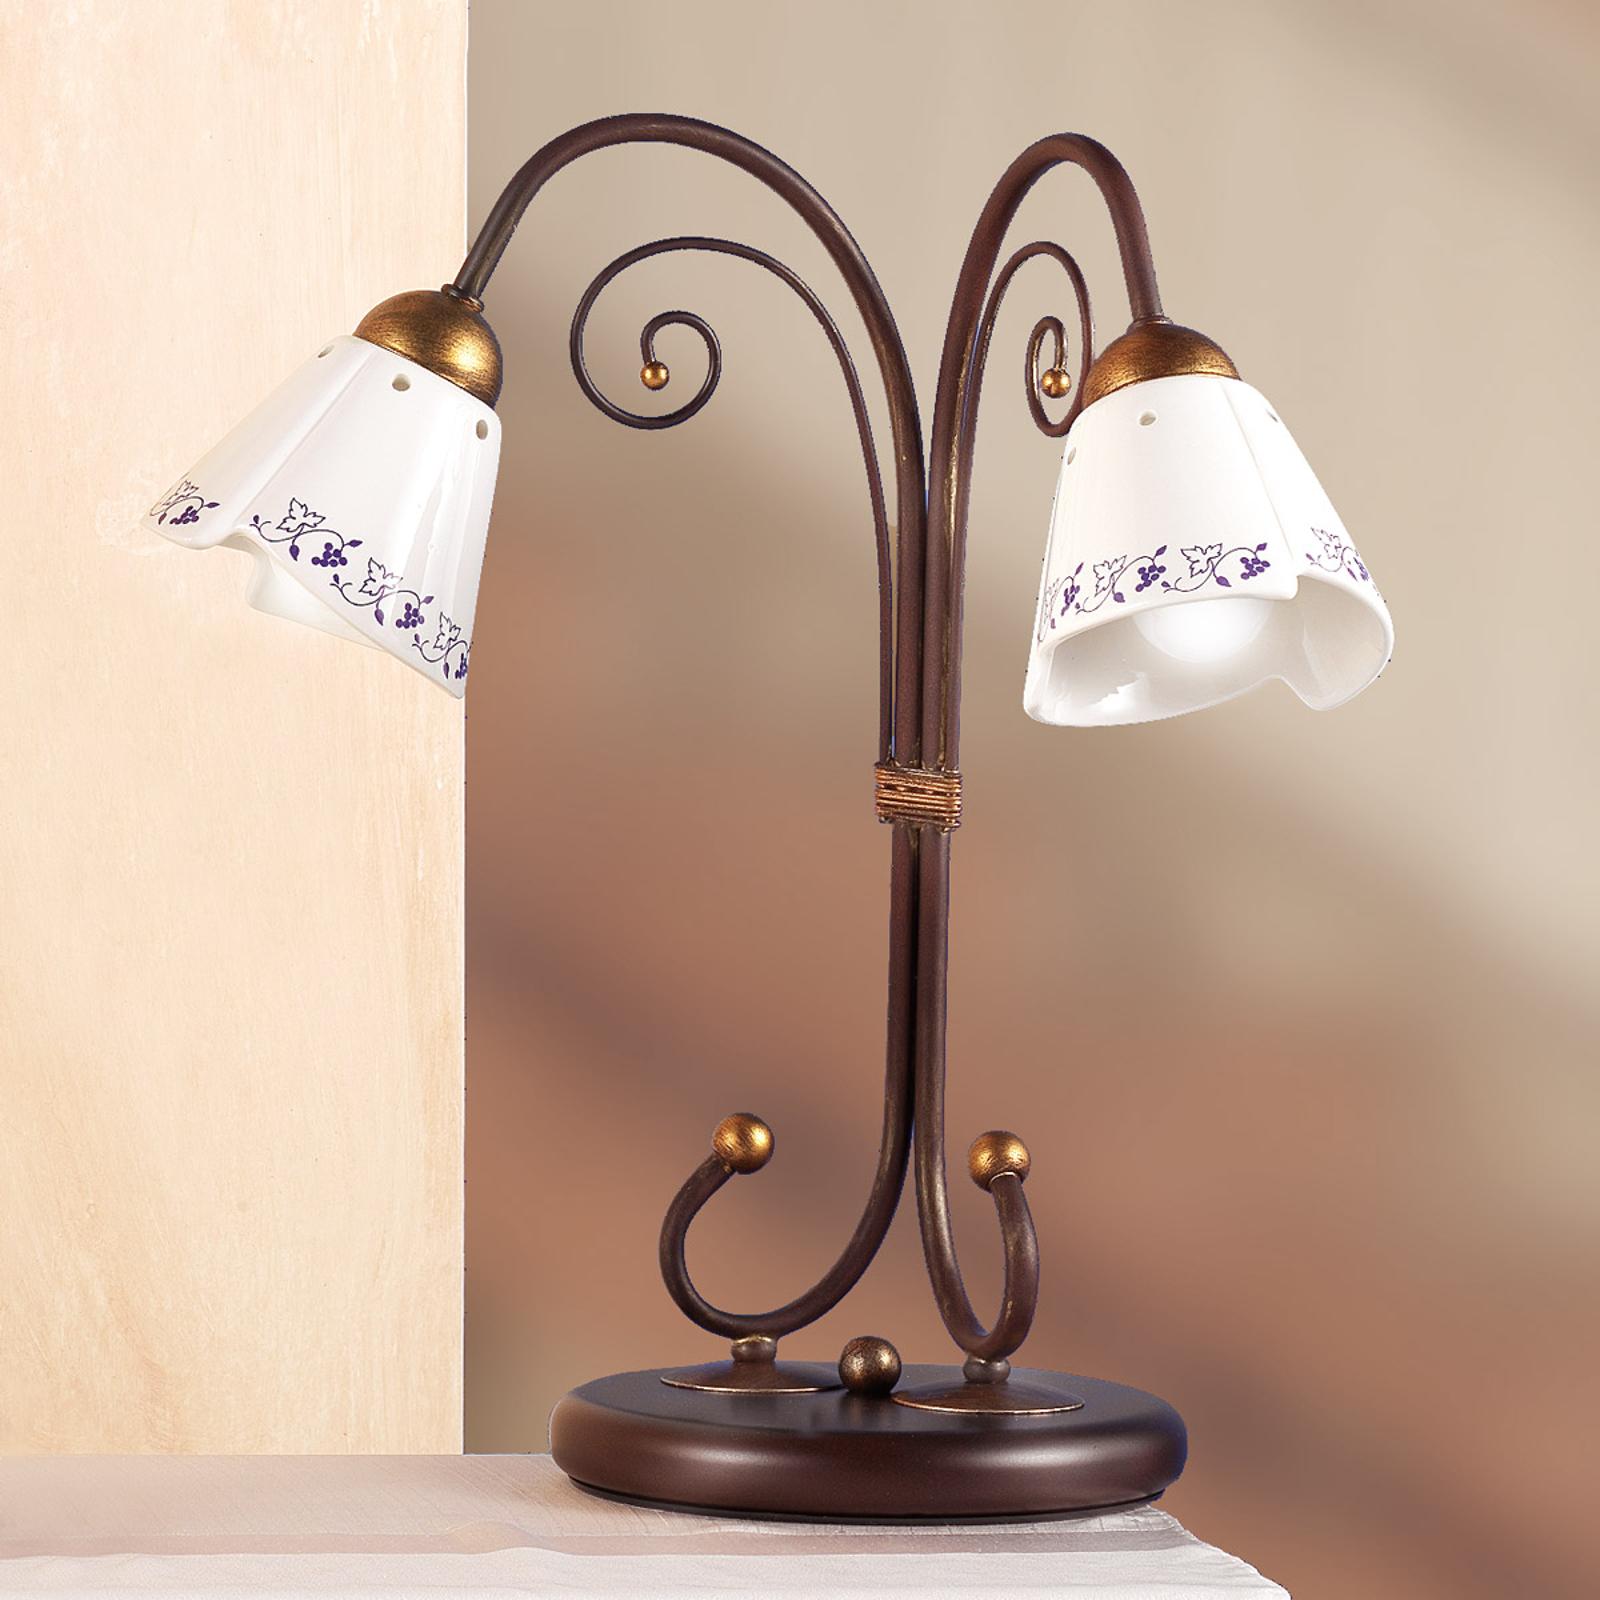 Lampe à poser élégante CARTOCCIO 2 lampes